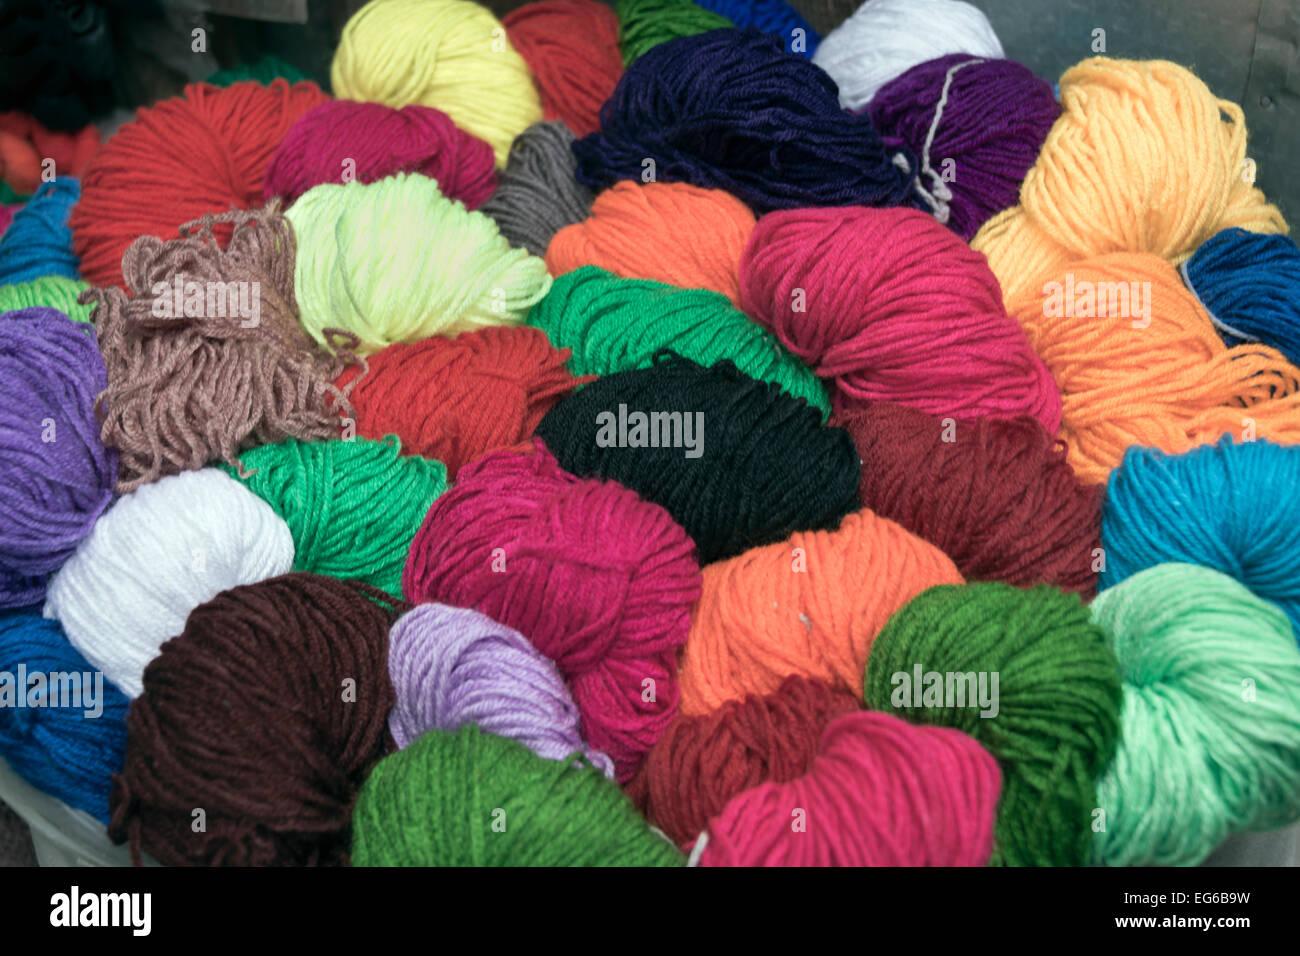 Multi-colored skeins of wool, Olgii main market, Western Mongolia - Stock Image